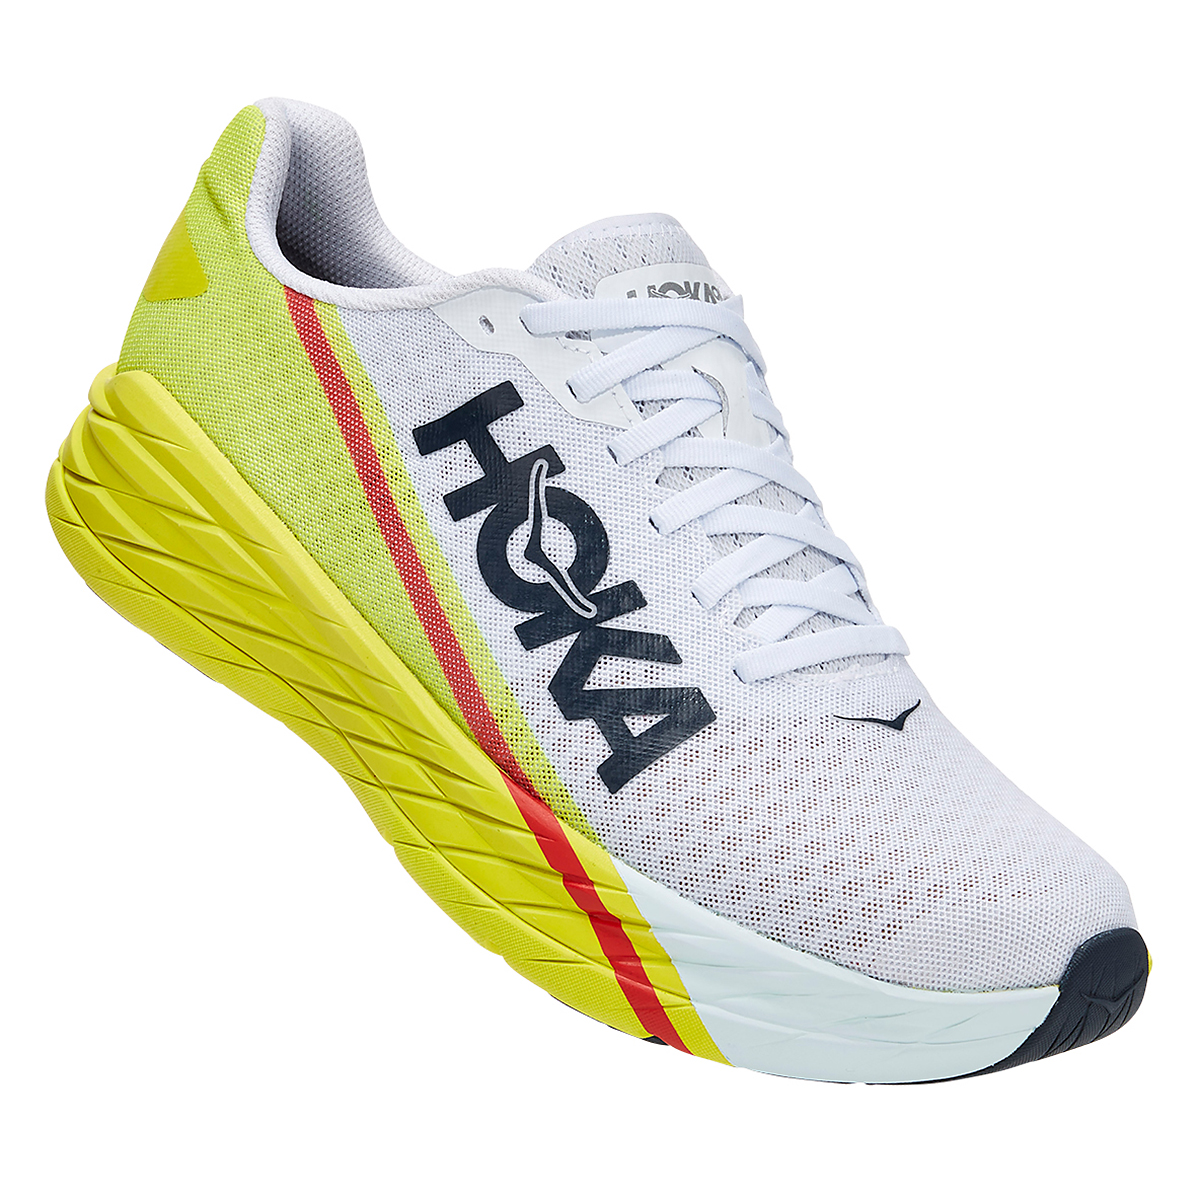 Men's Hoka One One Rocket X Running Shoe - Color: White/Evening Primrose - Size: 8.5 - Width: Regular, White/Evening Primrose, large, image 3